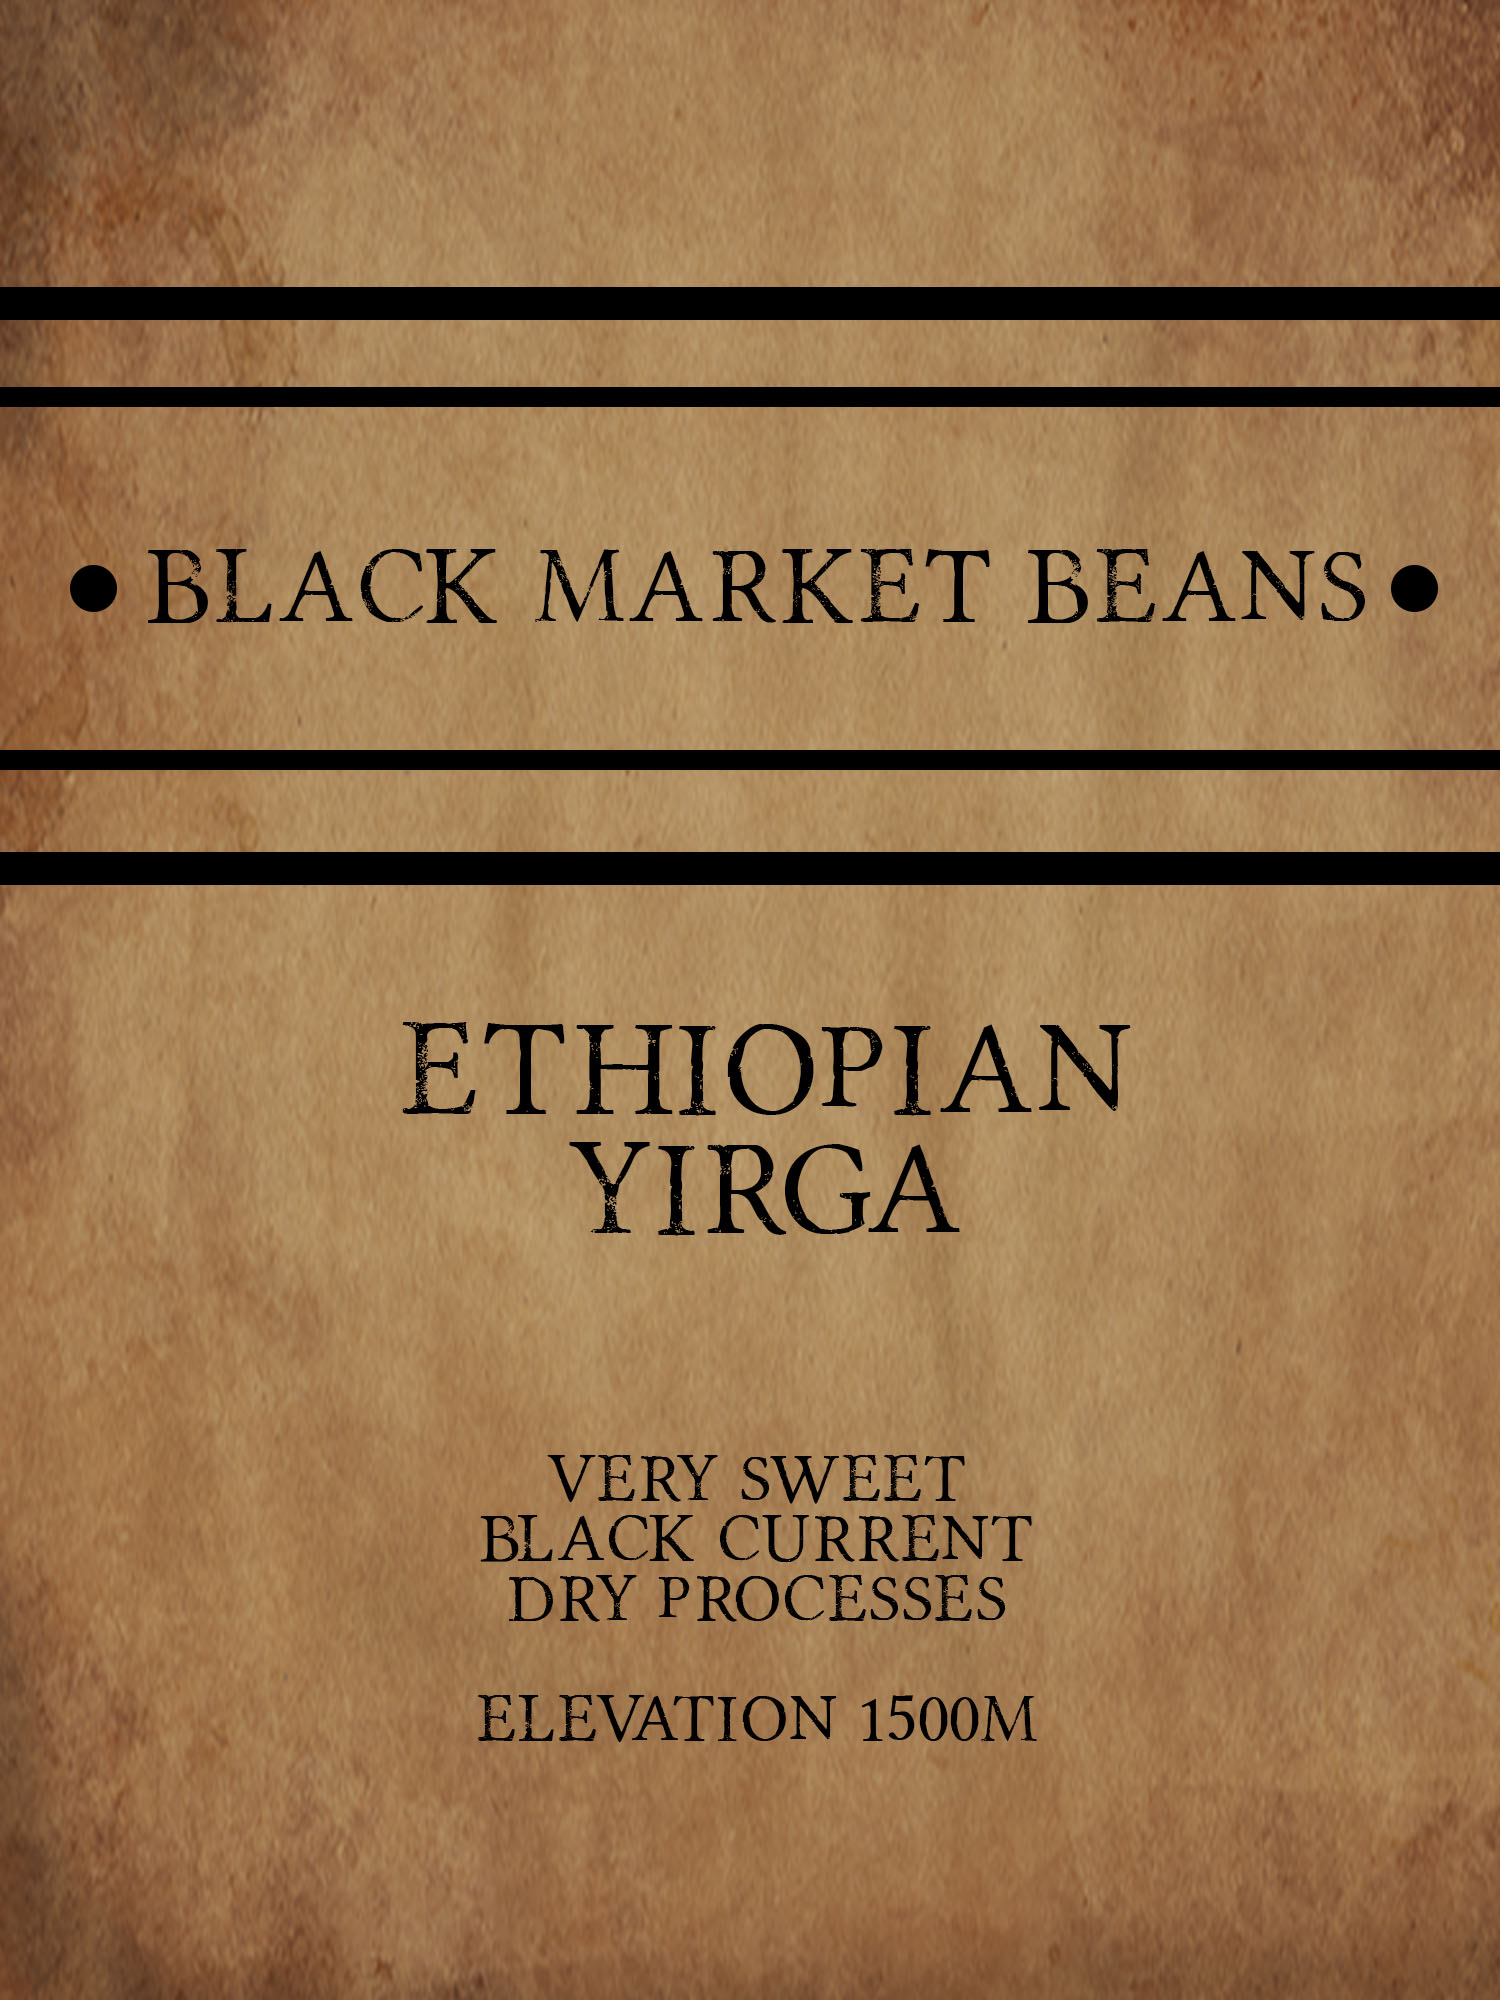 coffee_card_Ethiopian_Yirga.jpg